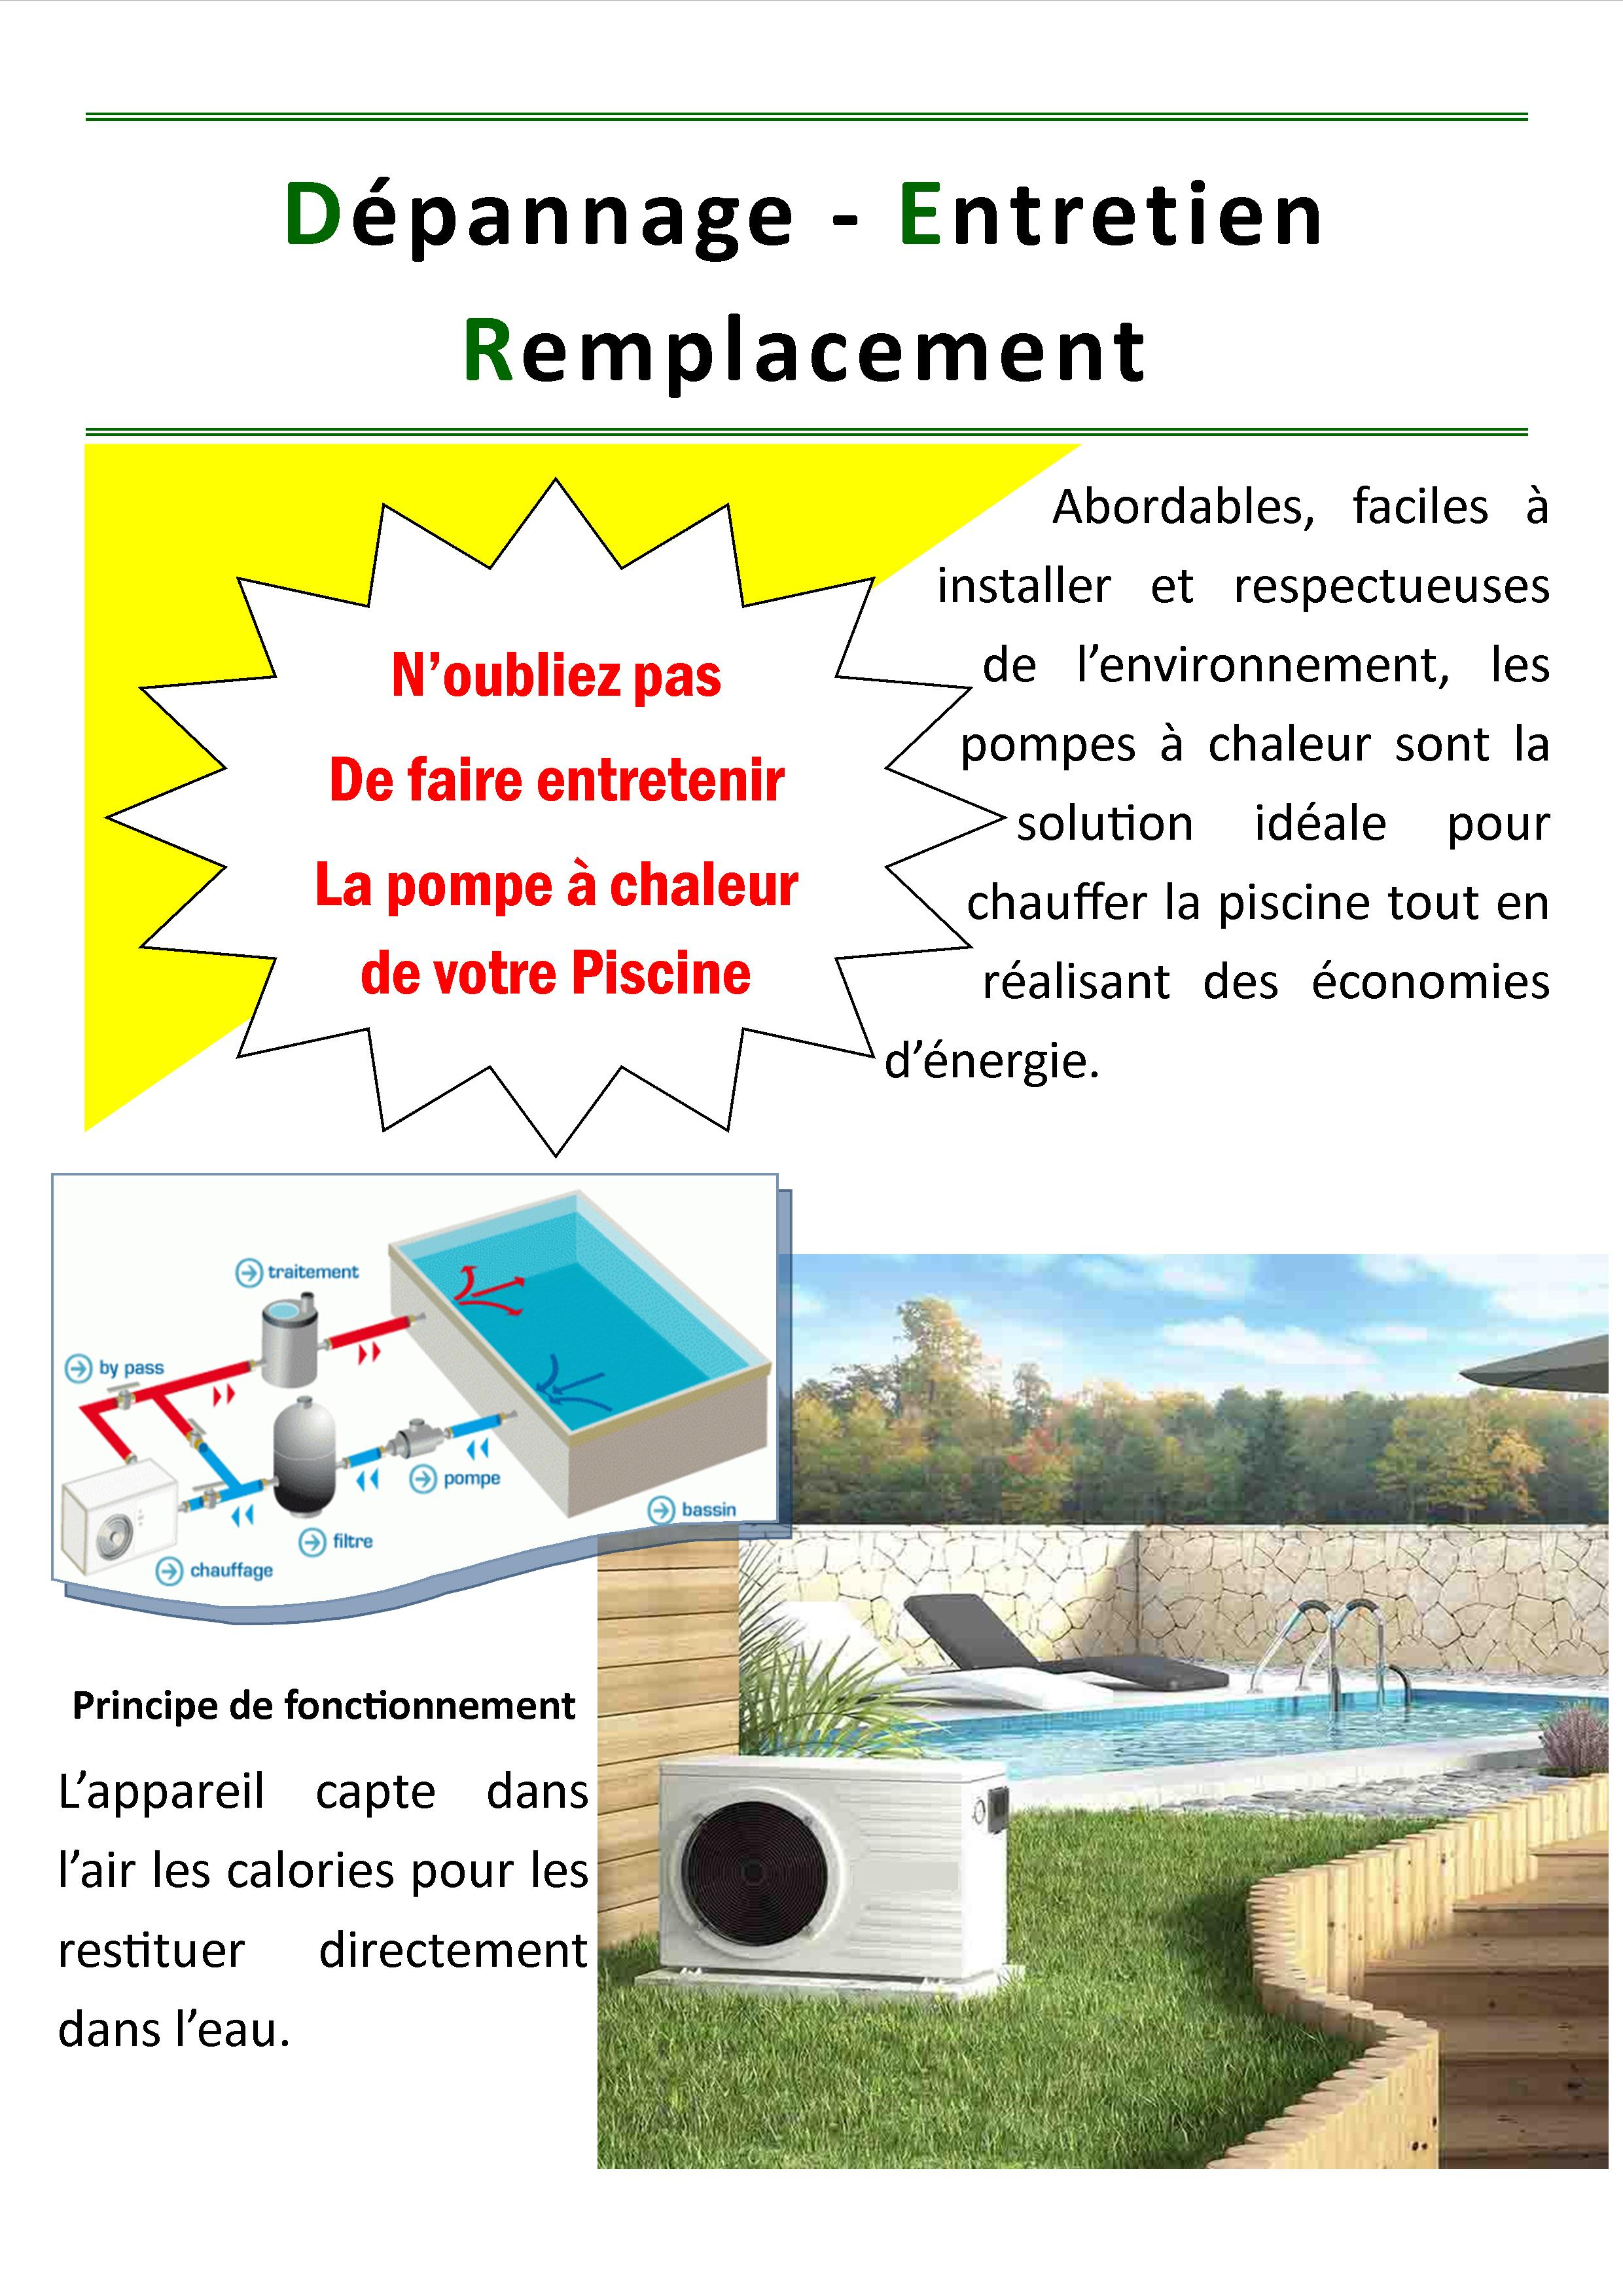 pompe chaleur piscine alexandre depannage. Black Bedroom Furniture Sets. Home Design Ideas